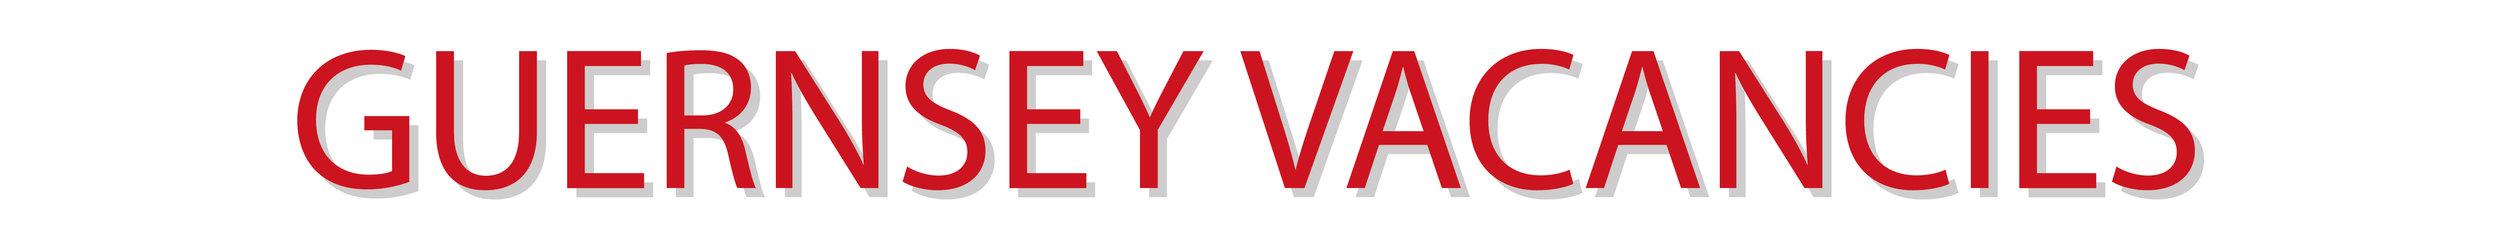 GUERNSEY VACANCIES-01-01.jpg